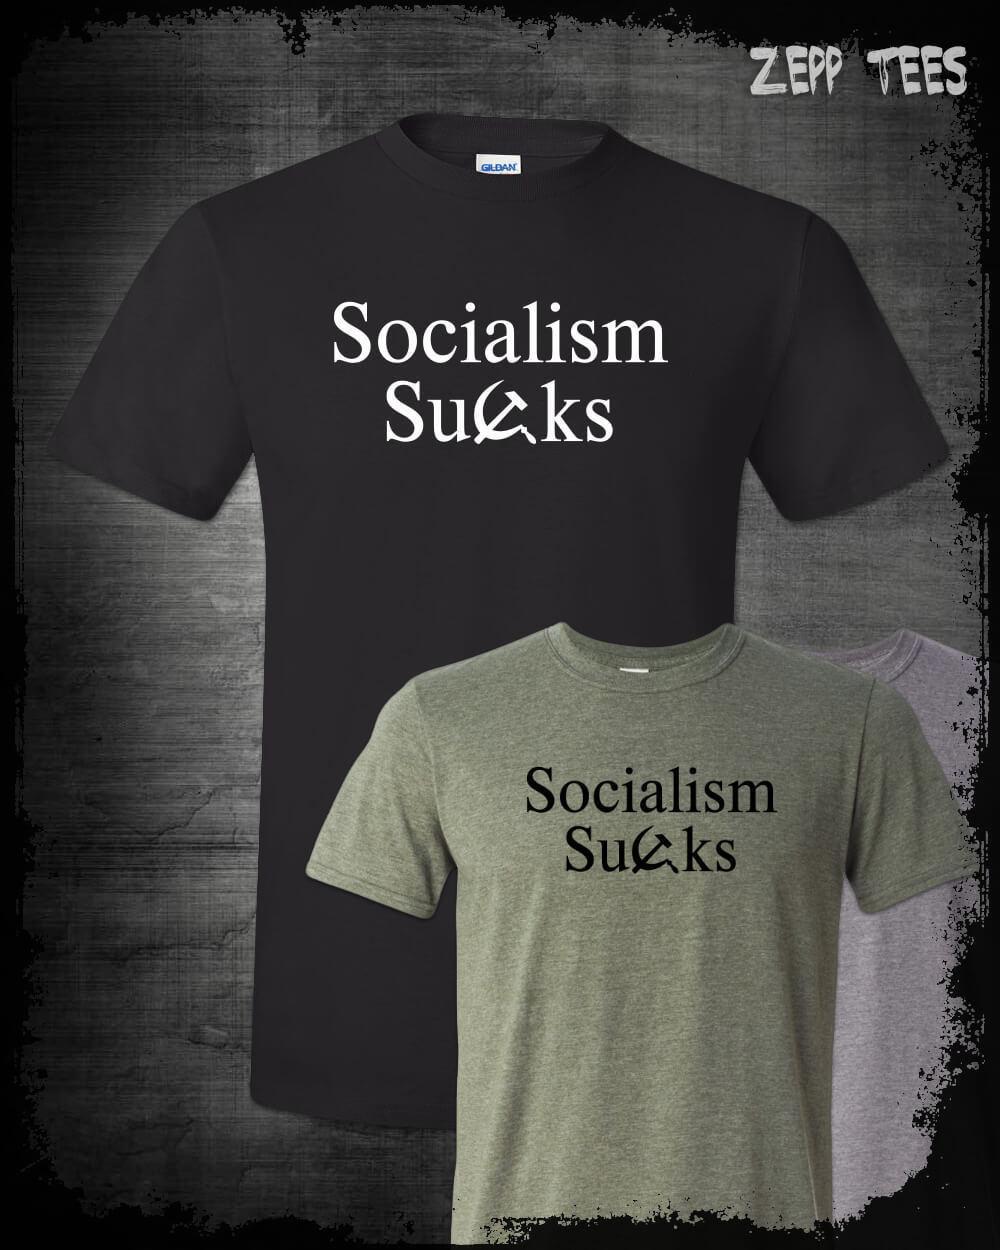 03230444 Socialism Sucks T Shirt Commie Scum Socialist Bernie Funny Libertarian  Patriot Funny Unisex Casual Tshirt Top Cool Tee Shirts Cool Tees From  Happyjapanuk, ...